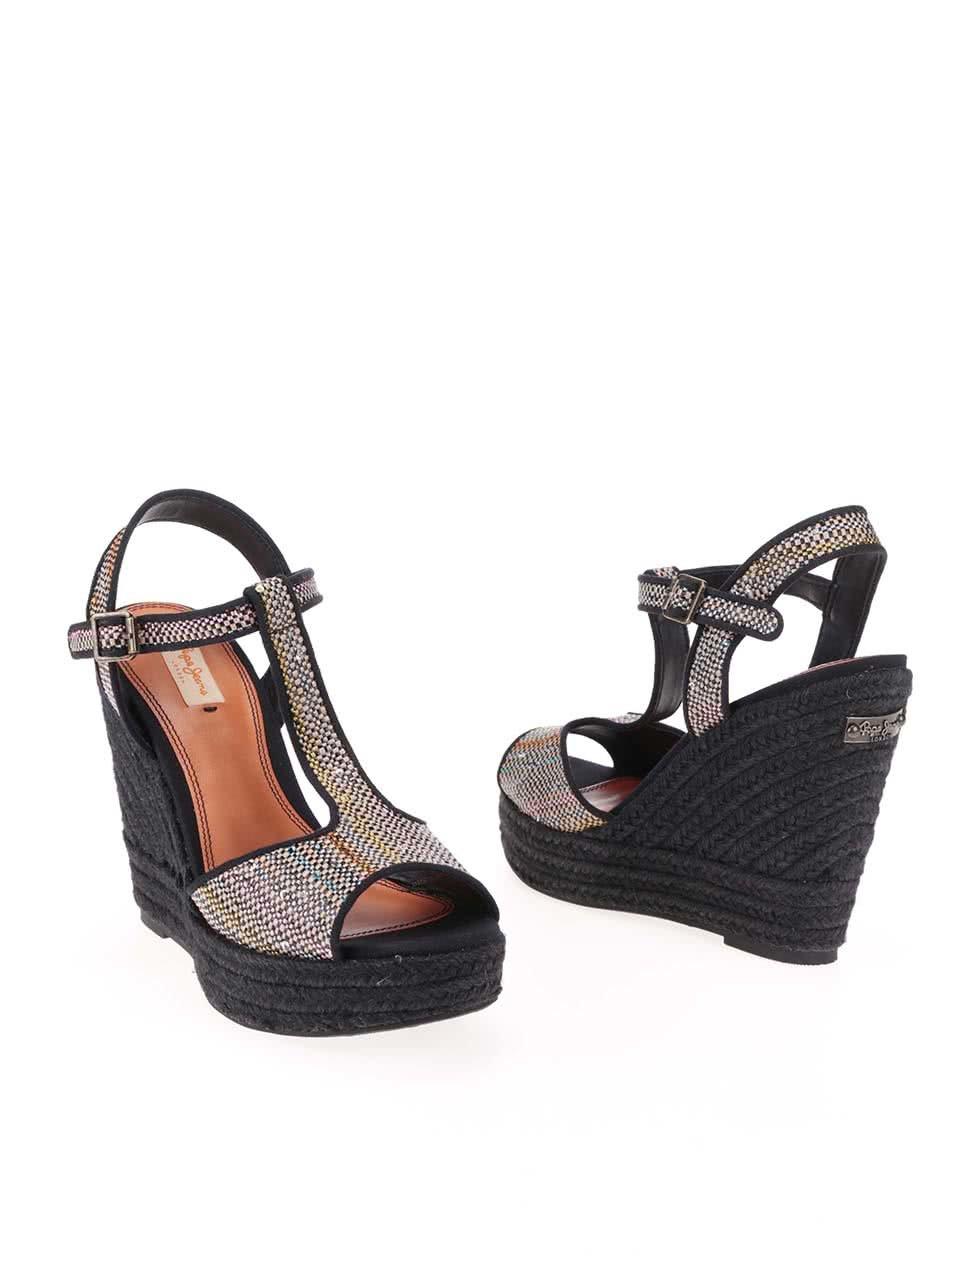 fe03f2c41396 Čierne dámske sandále s flitrami na platforme Pepe Jeans ...